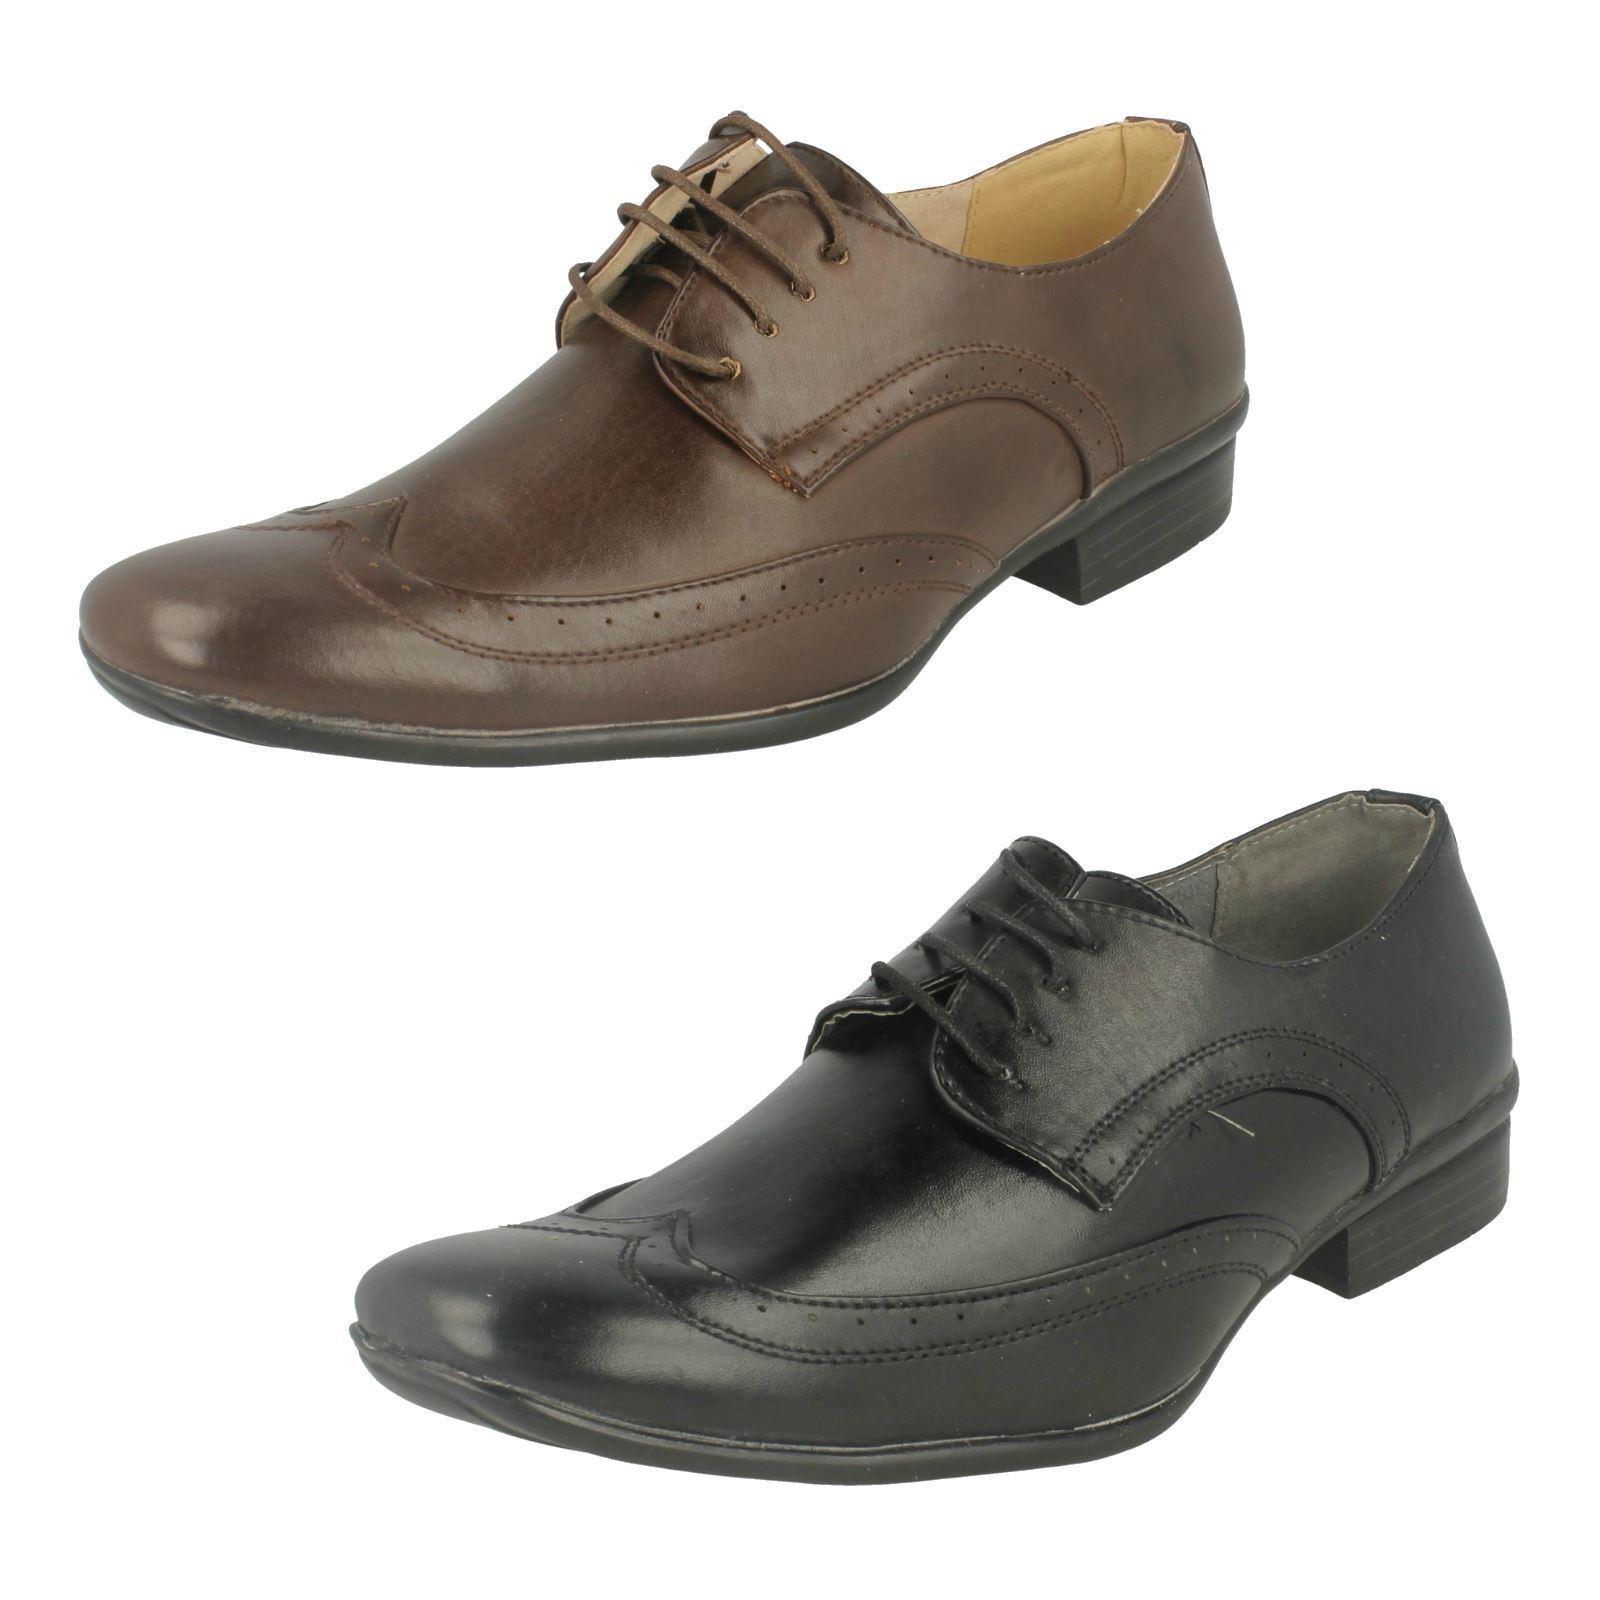 a2076- Hombre MAVERICK Oxford Cuero Con Cordones Zapato Oxford MAVERICK zapatos- Negro&Marrón ec6492